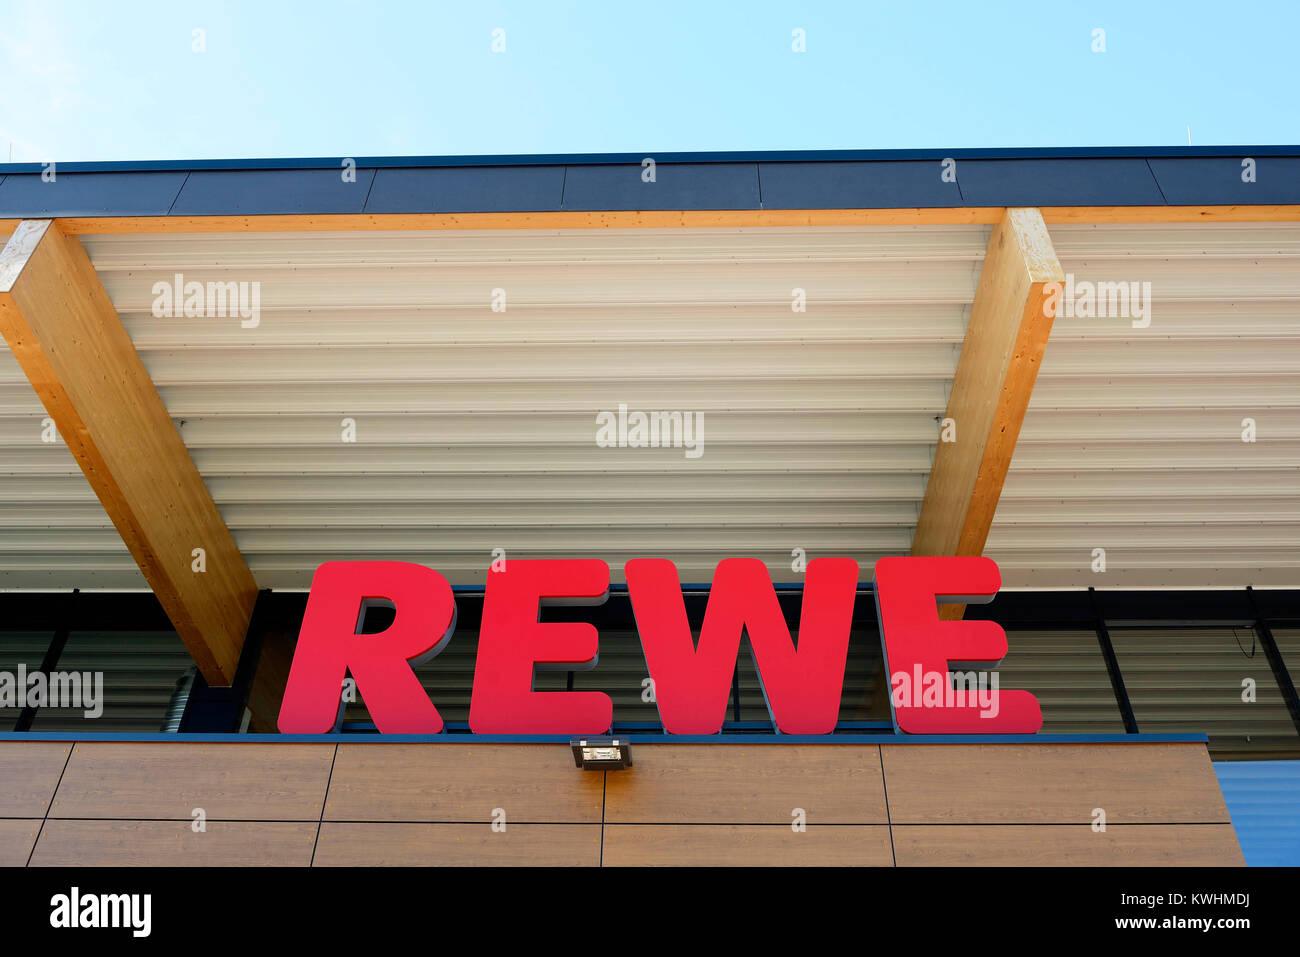 Rewe supermarket, Rewe Supermarkt - Stock Image